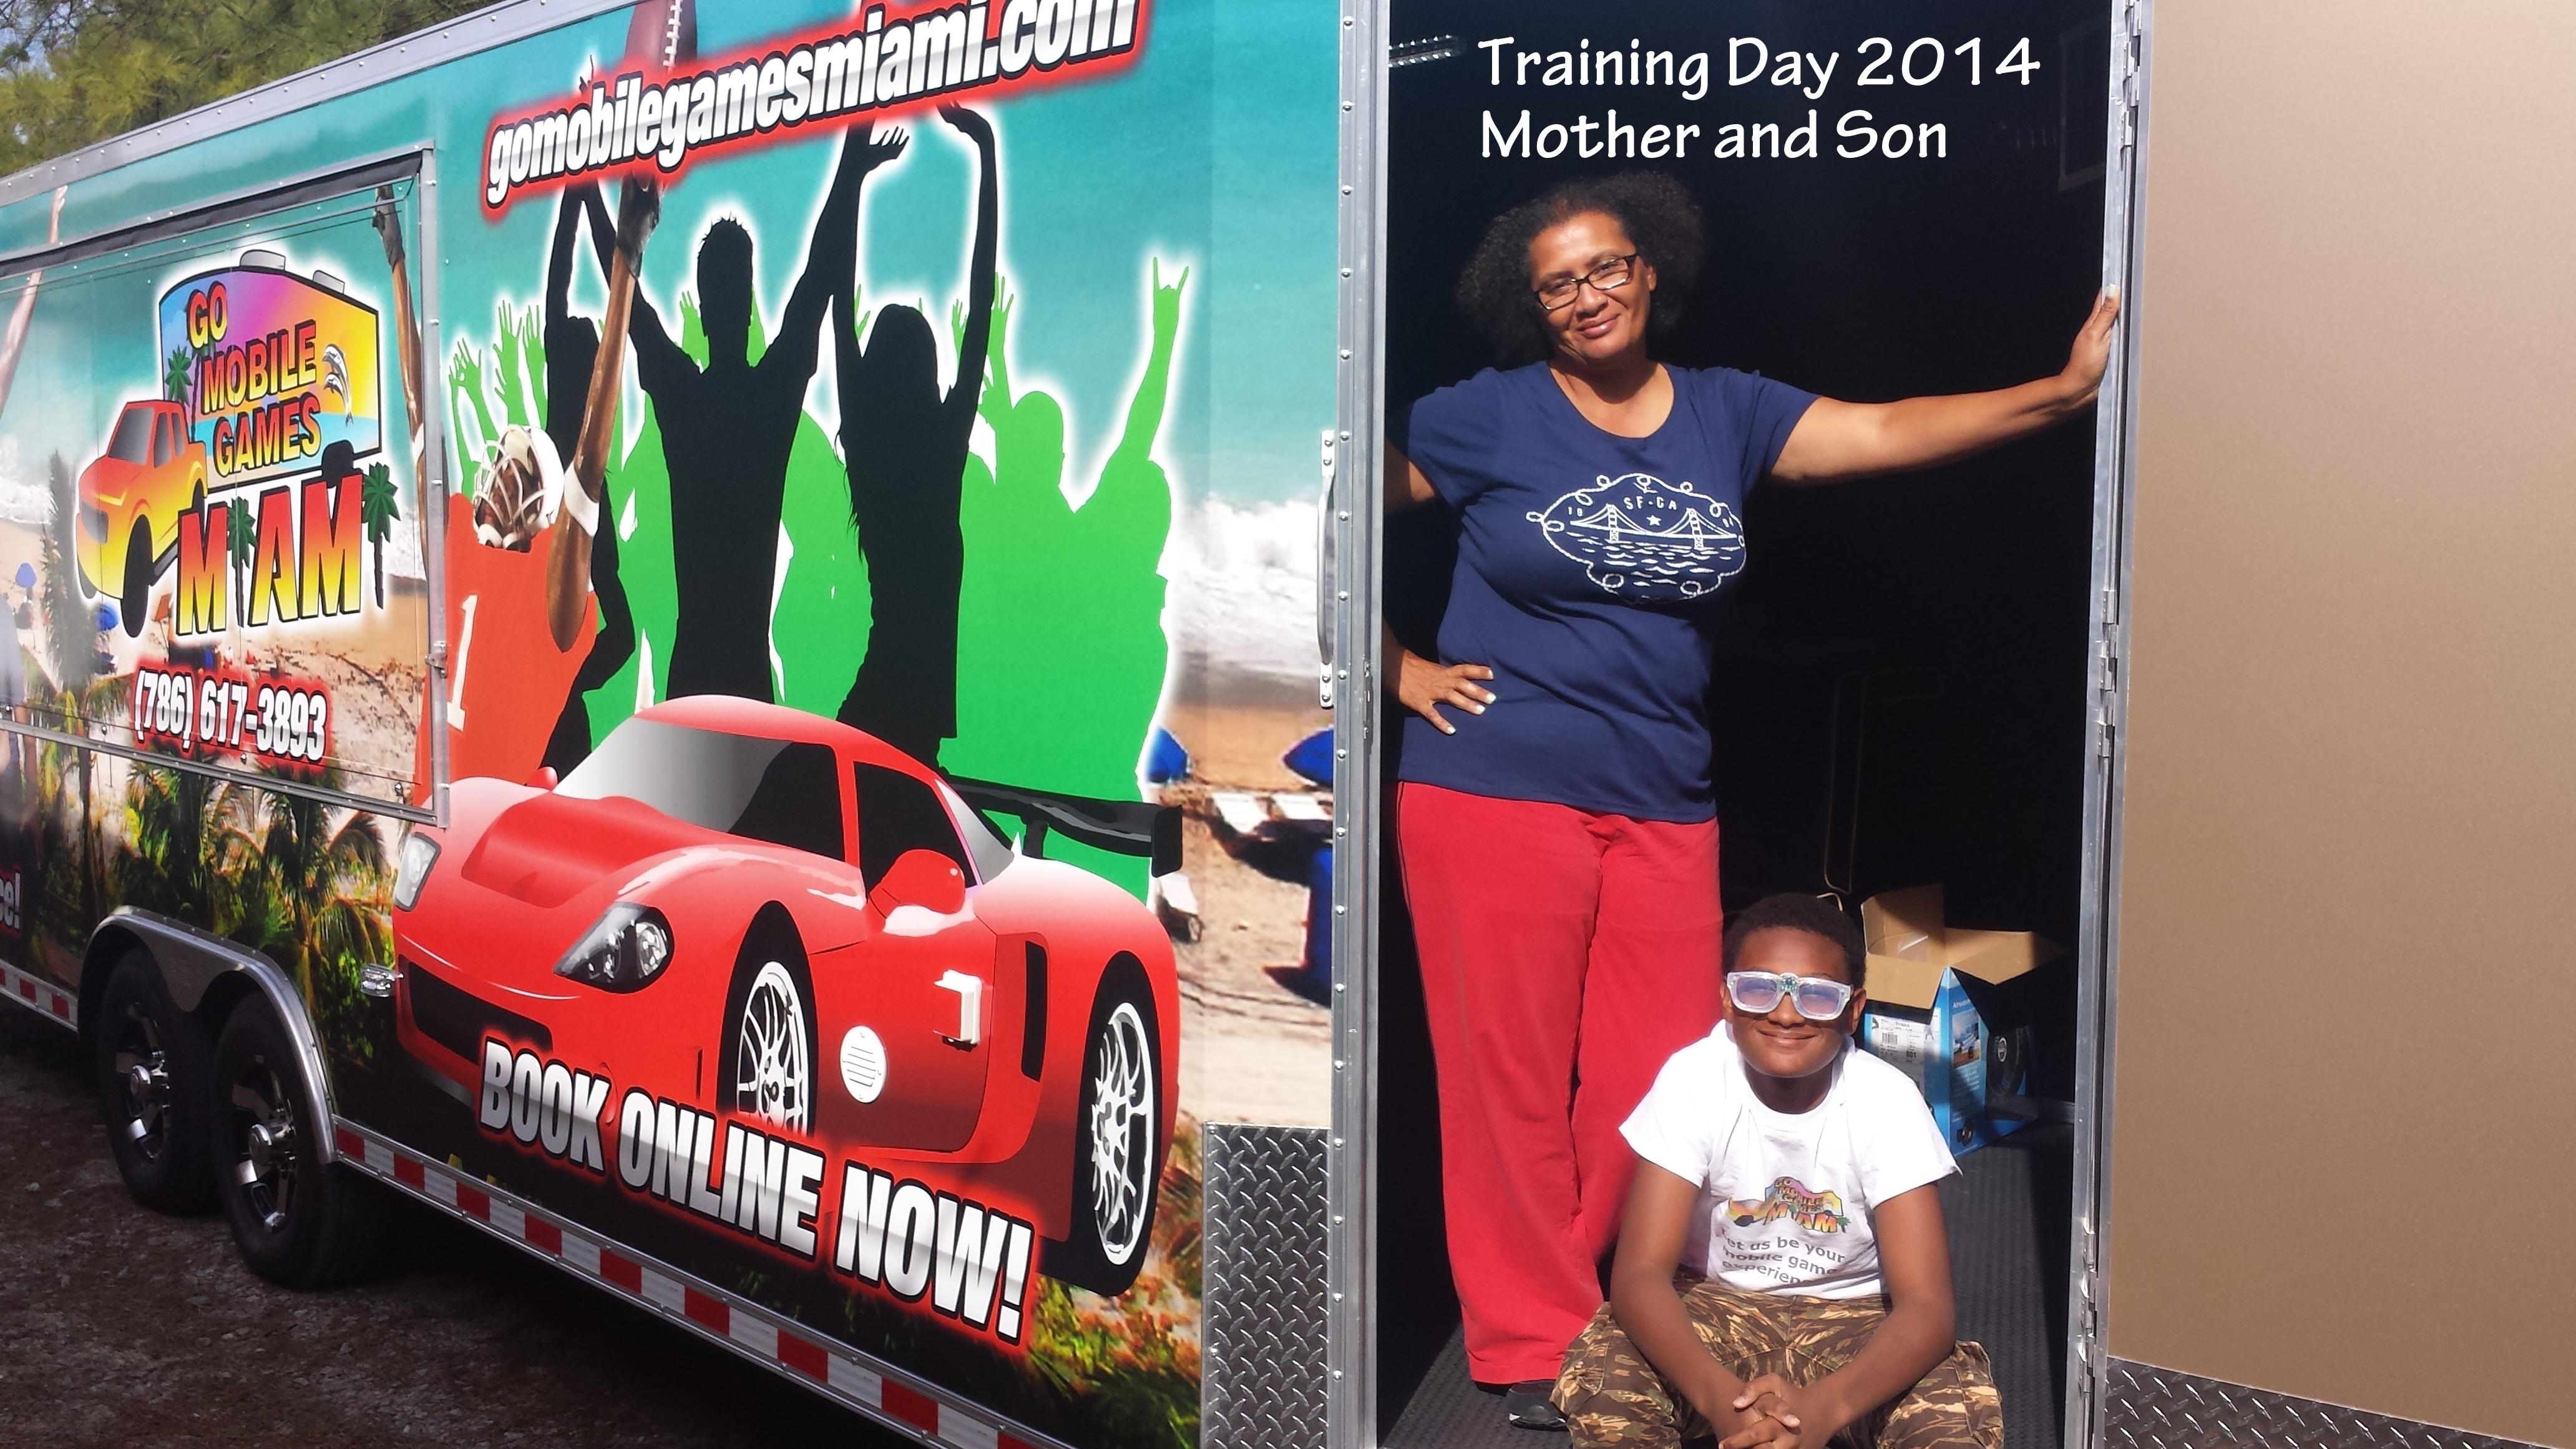 2014 Go Mobile Games Miami's Training Day